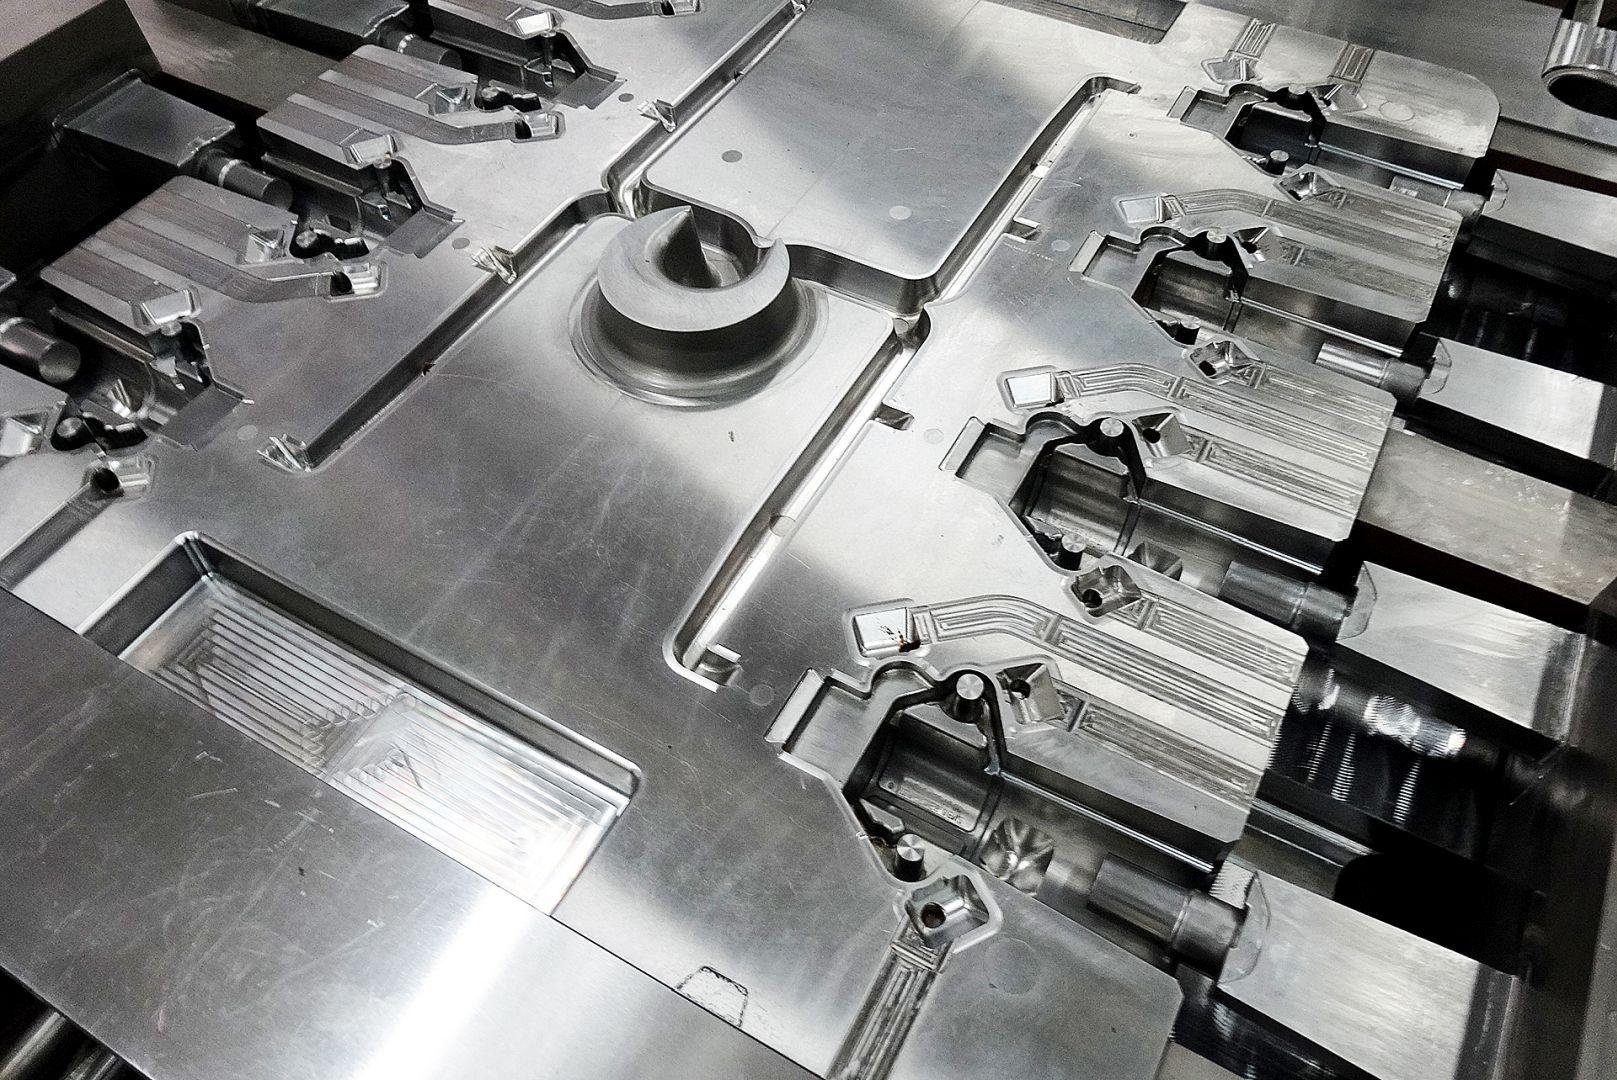 Toolshop–Werkzeugbau–orodjarstvo-7 Orodja za tlacno litje _ slika 5